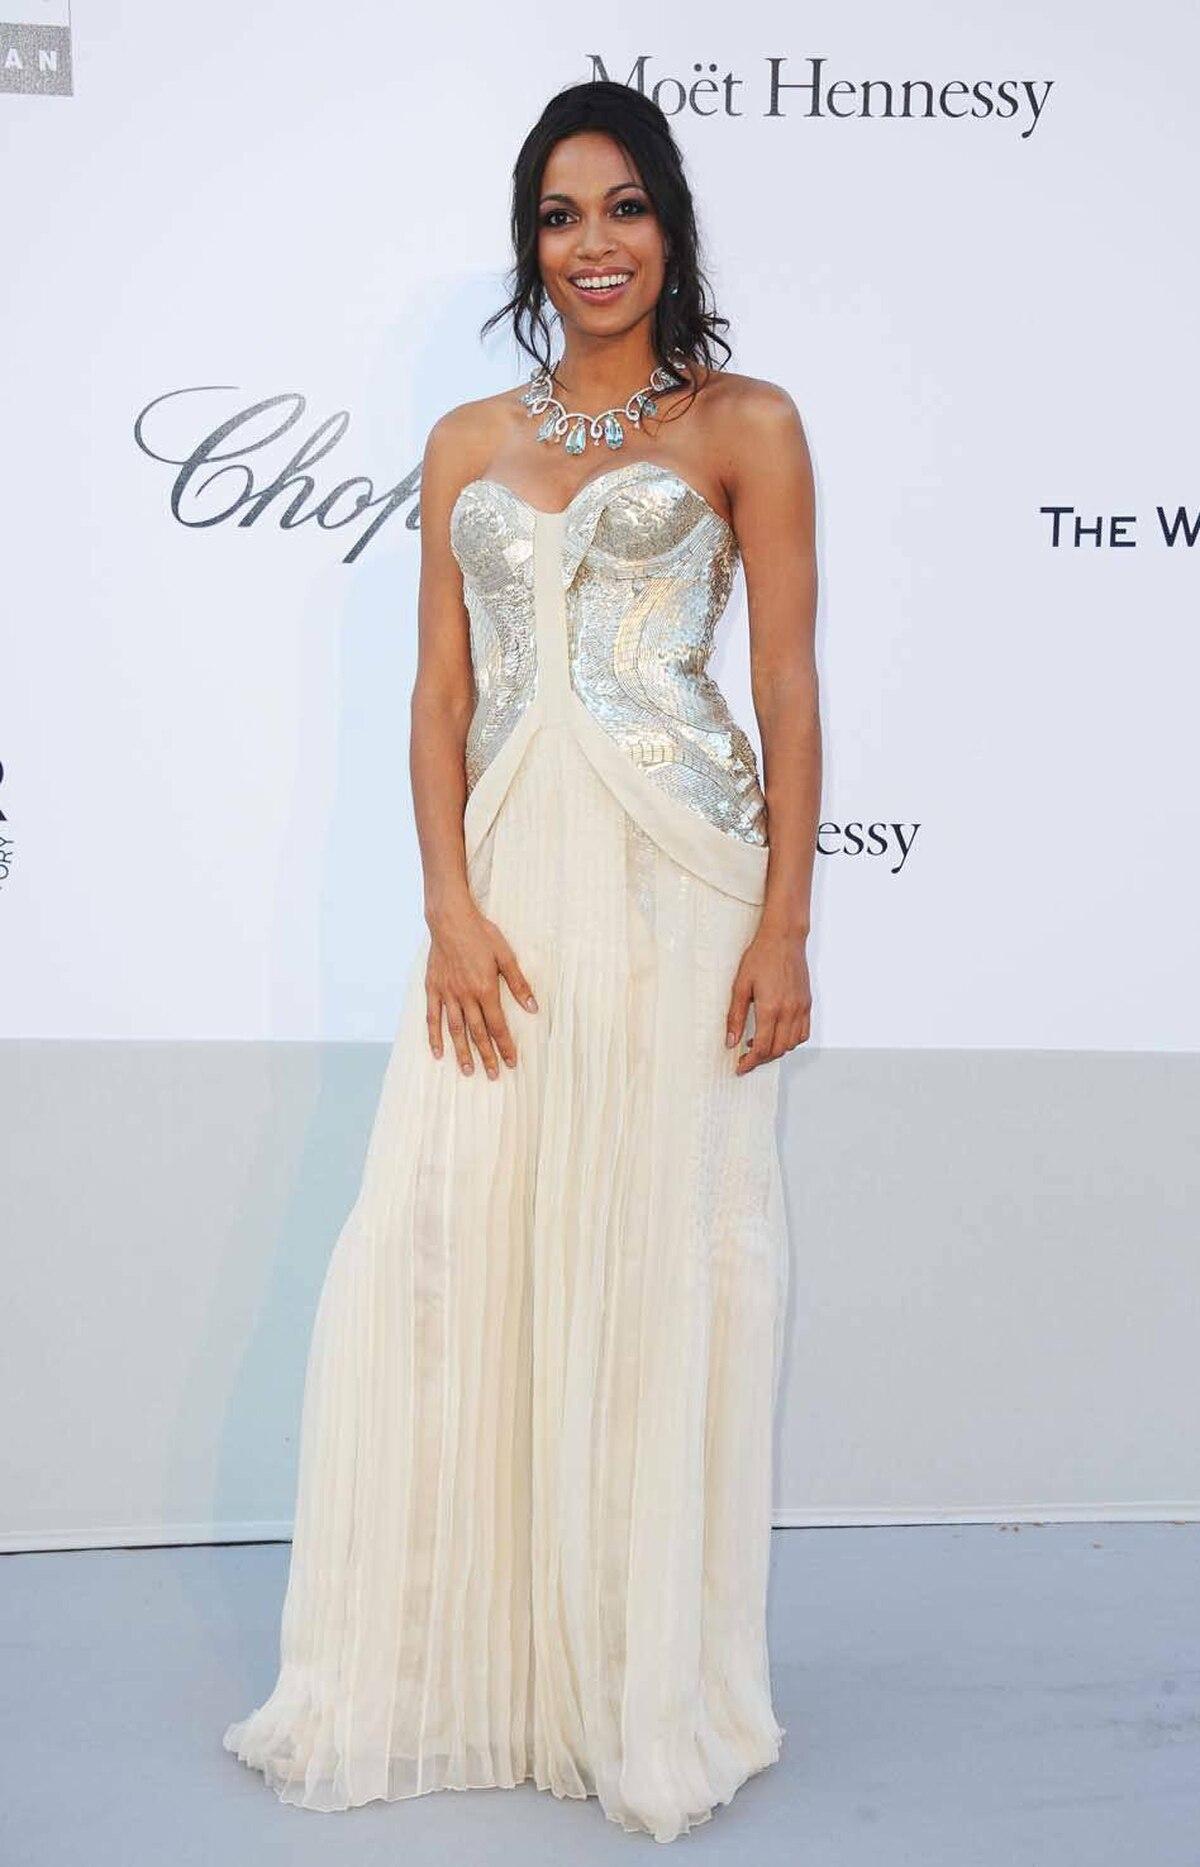 Rosario Dawson attends amfAR's Cinema Against AIDS Gala at the Cannes Film Festival on Thursday.